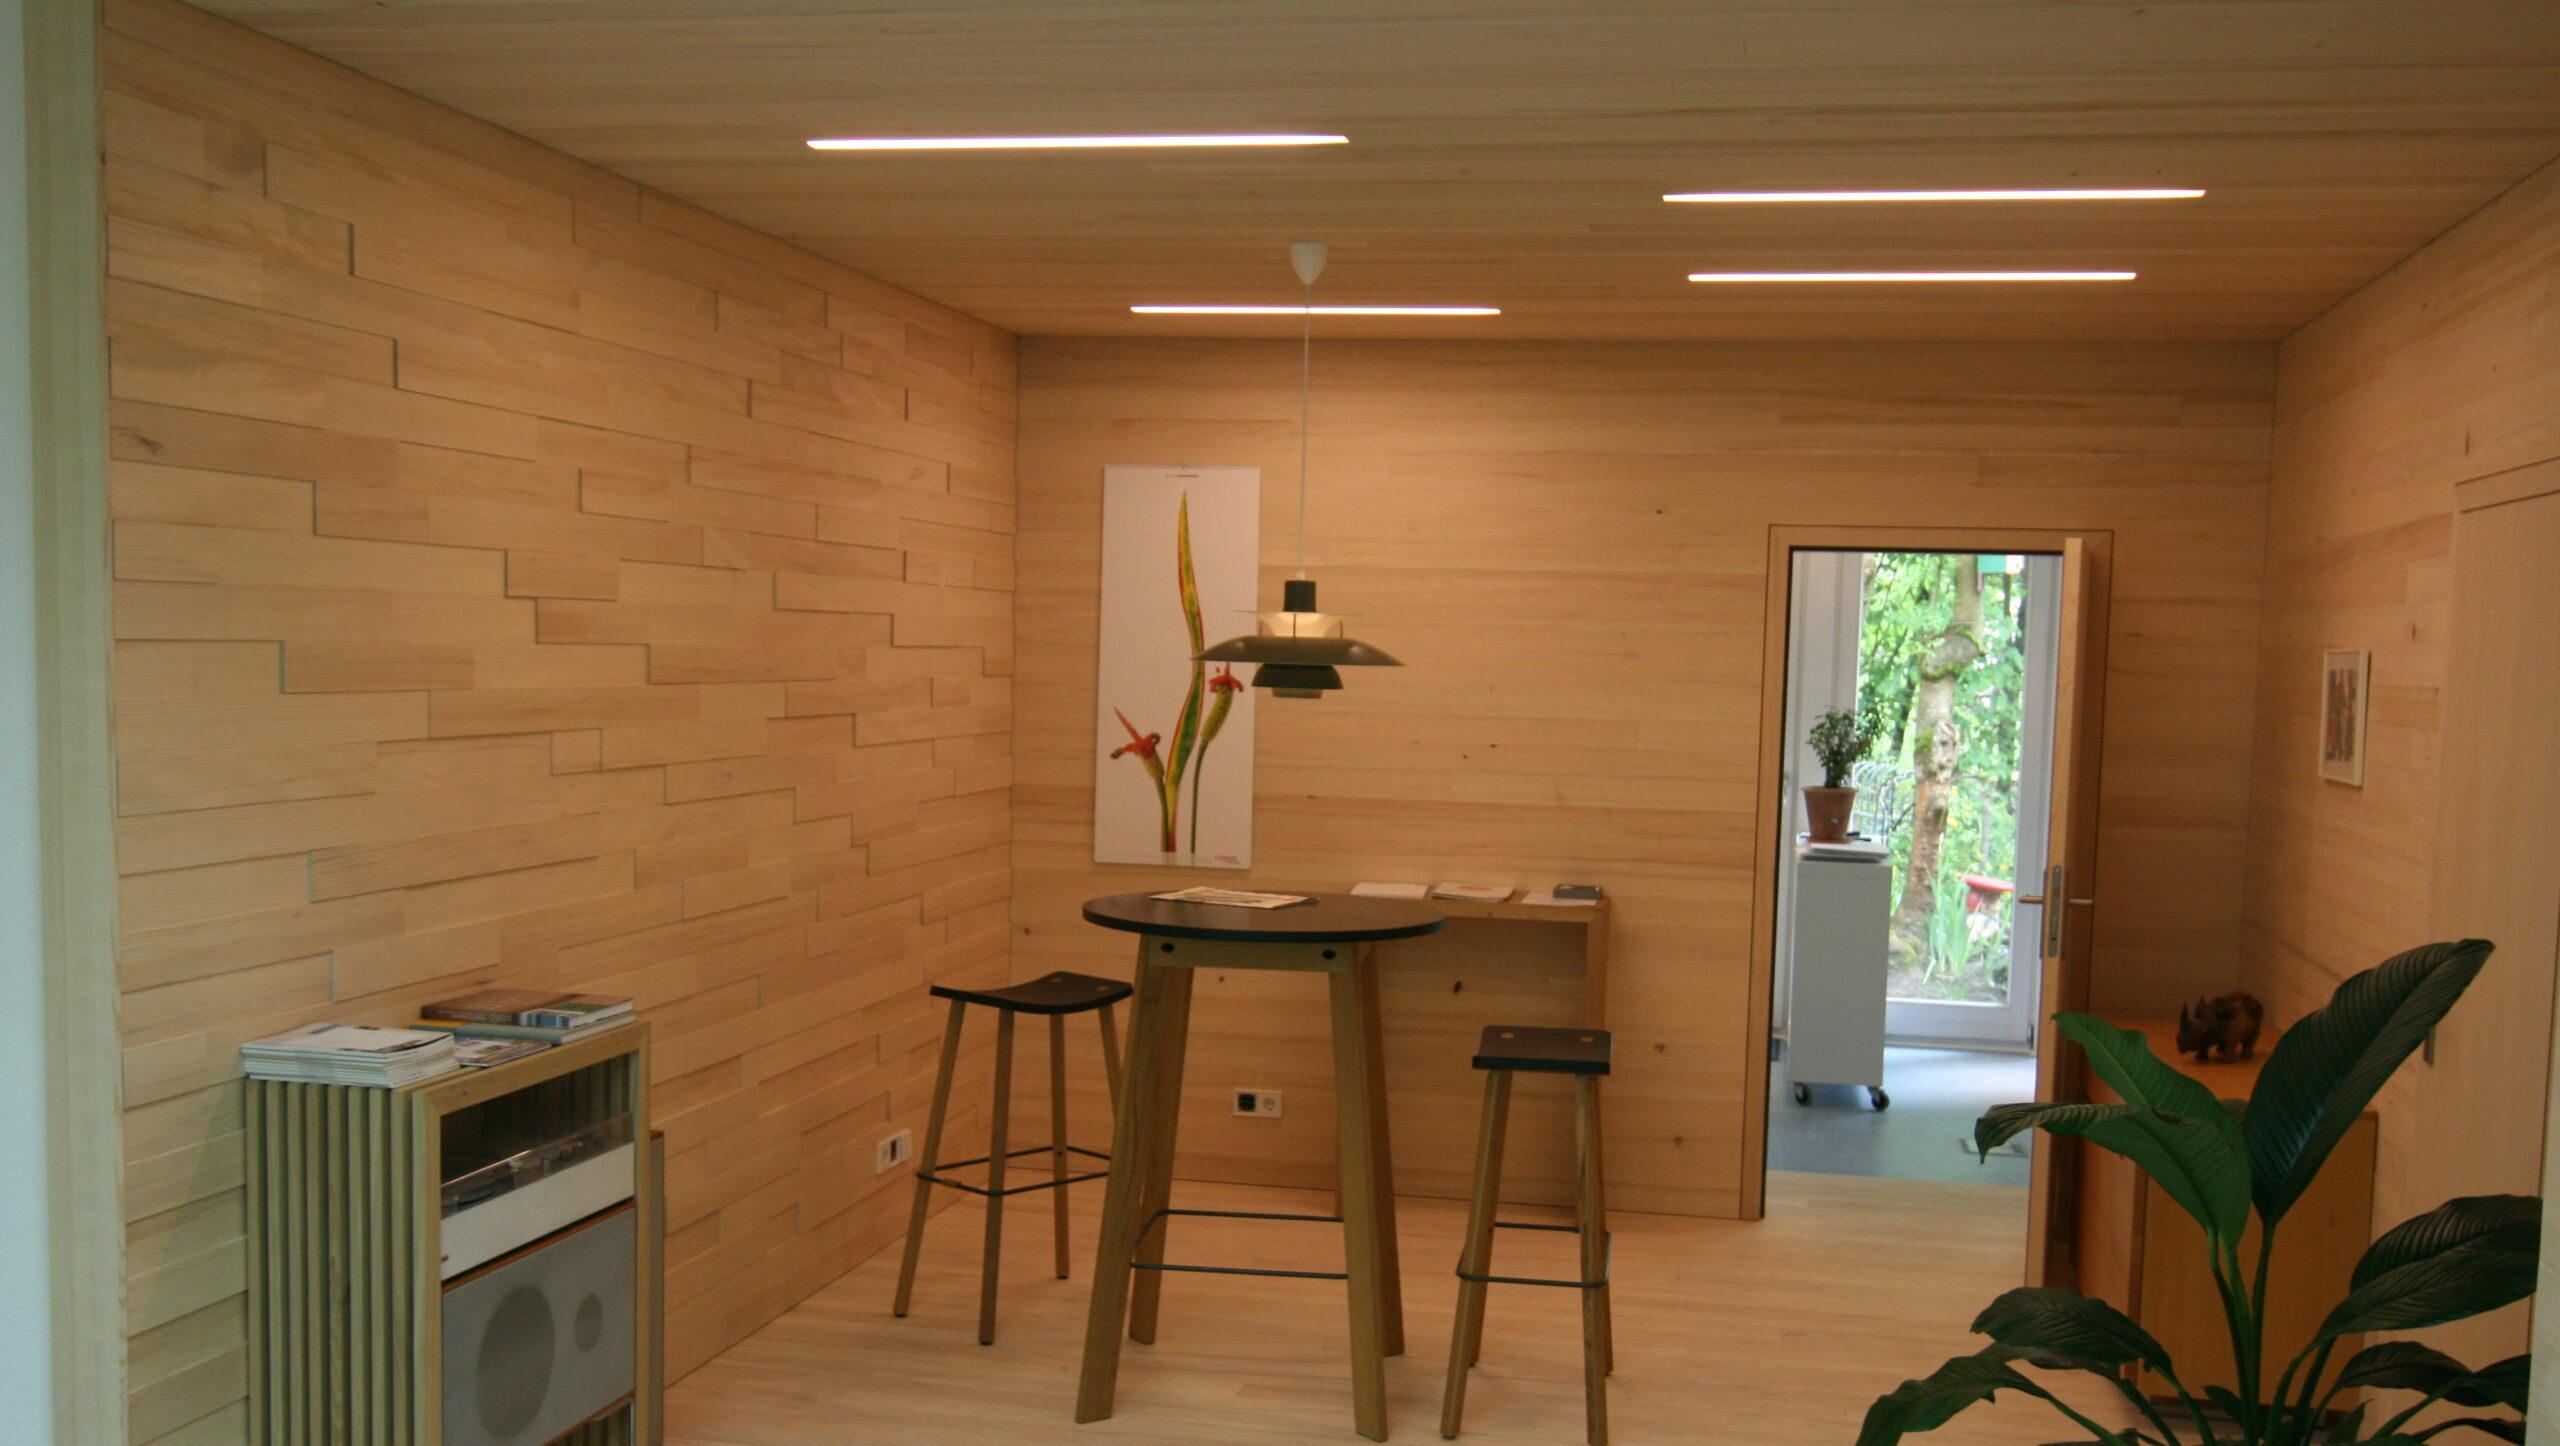 Kleiser Holzhandwerk - Waende